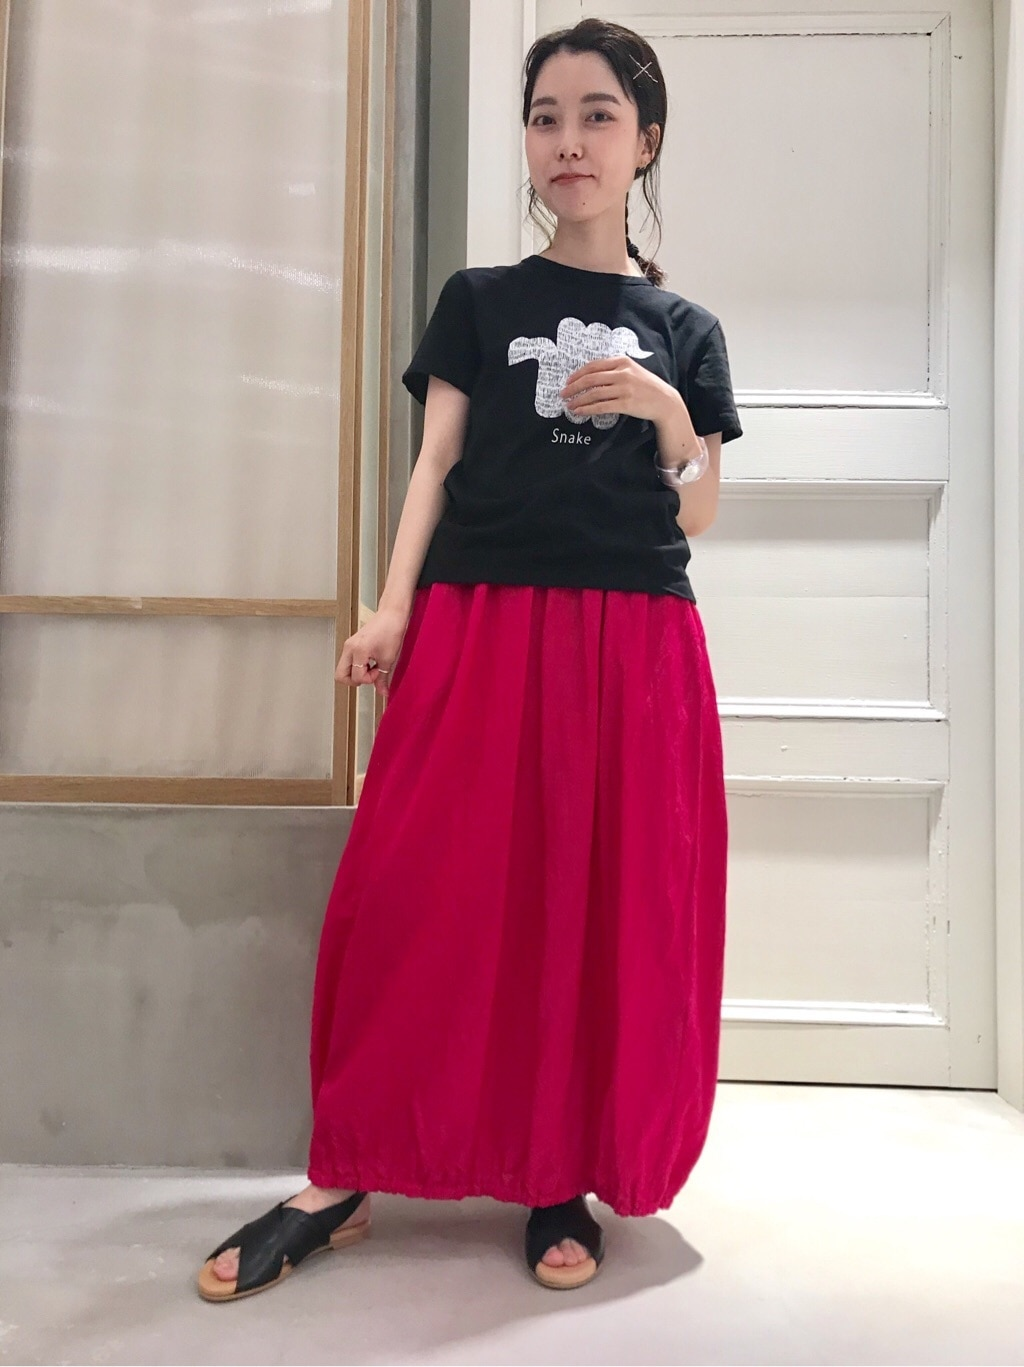 bulle de savon 渋谷スクランブルスクエア 身長:153cm 2020.07.15